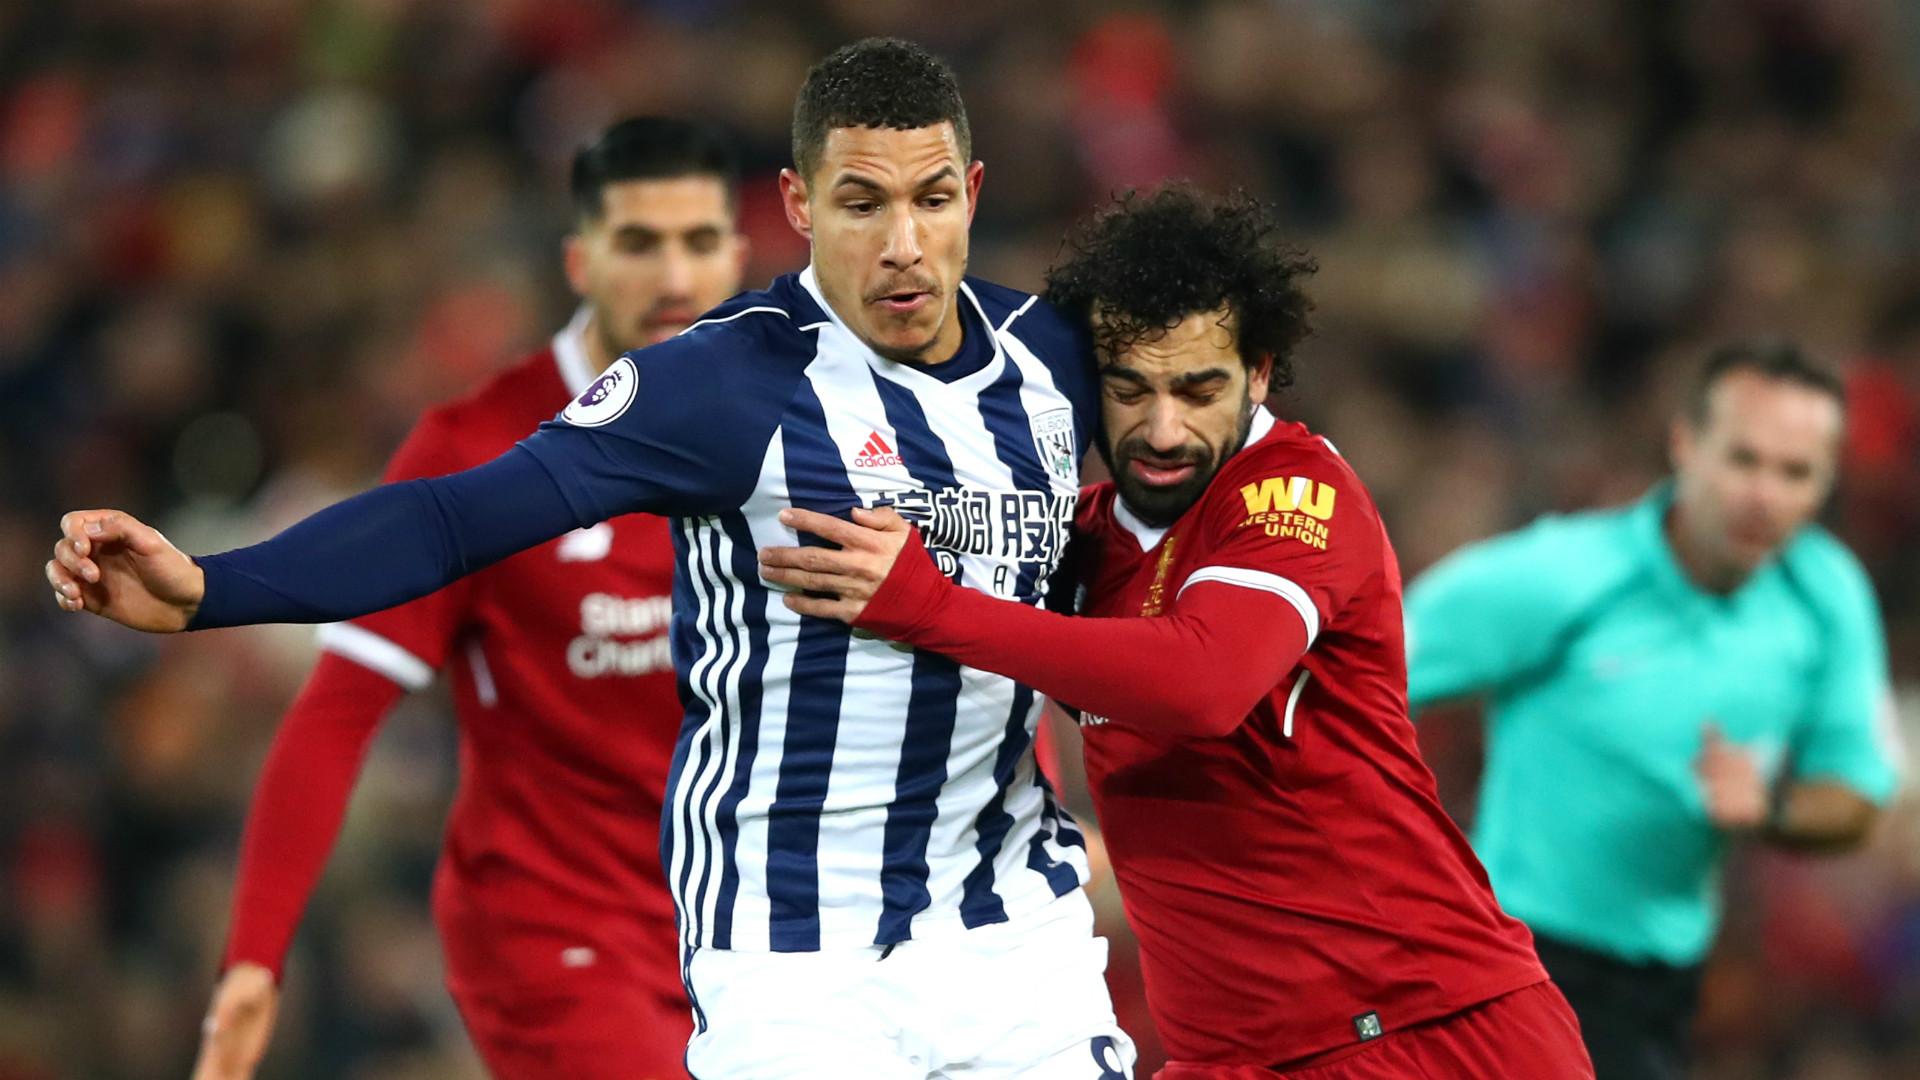 Jake Livermore Mohamed Salah West Brom Liverpool